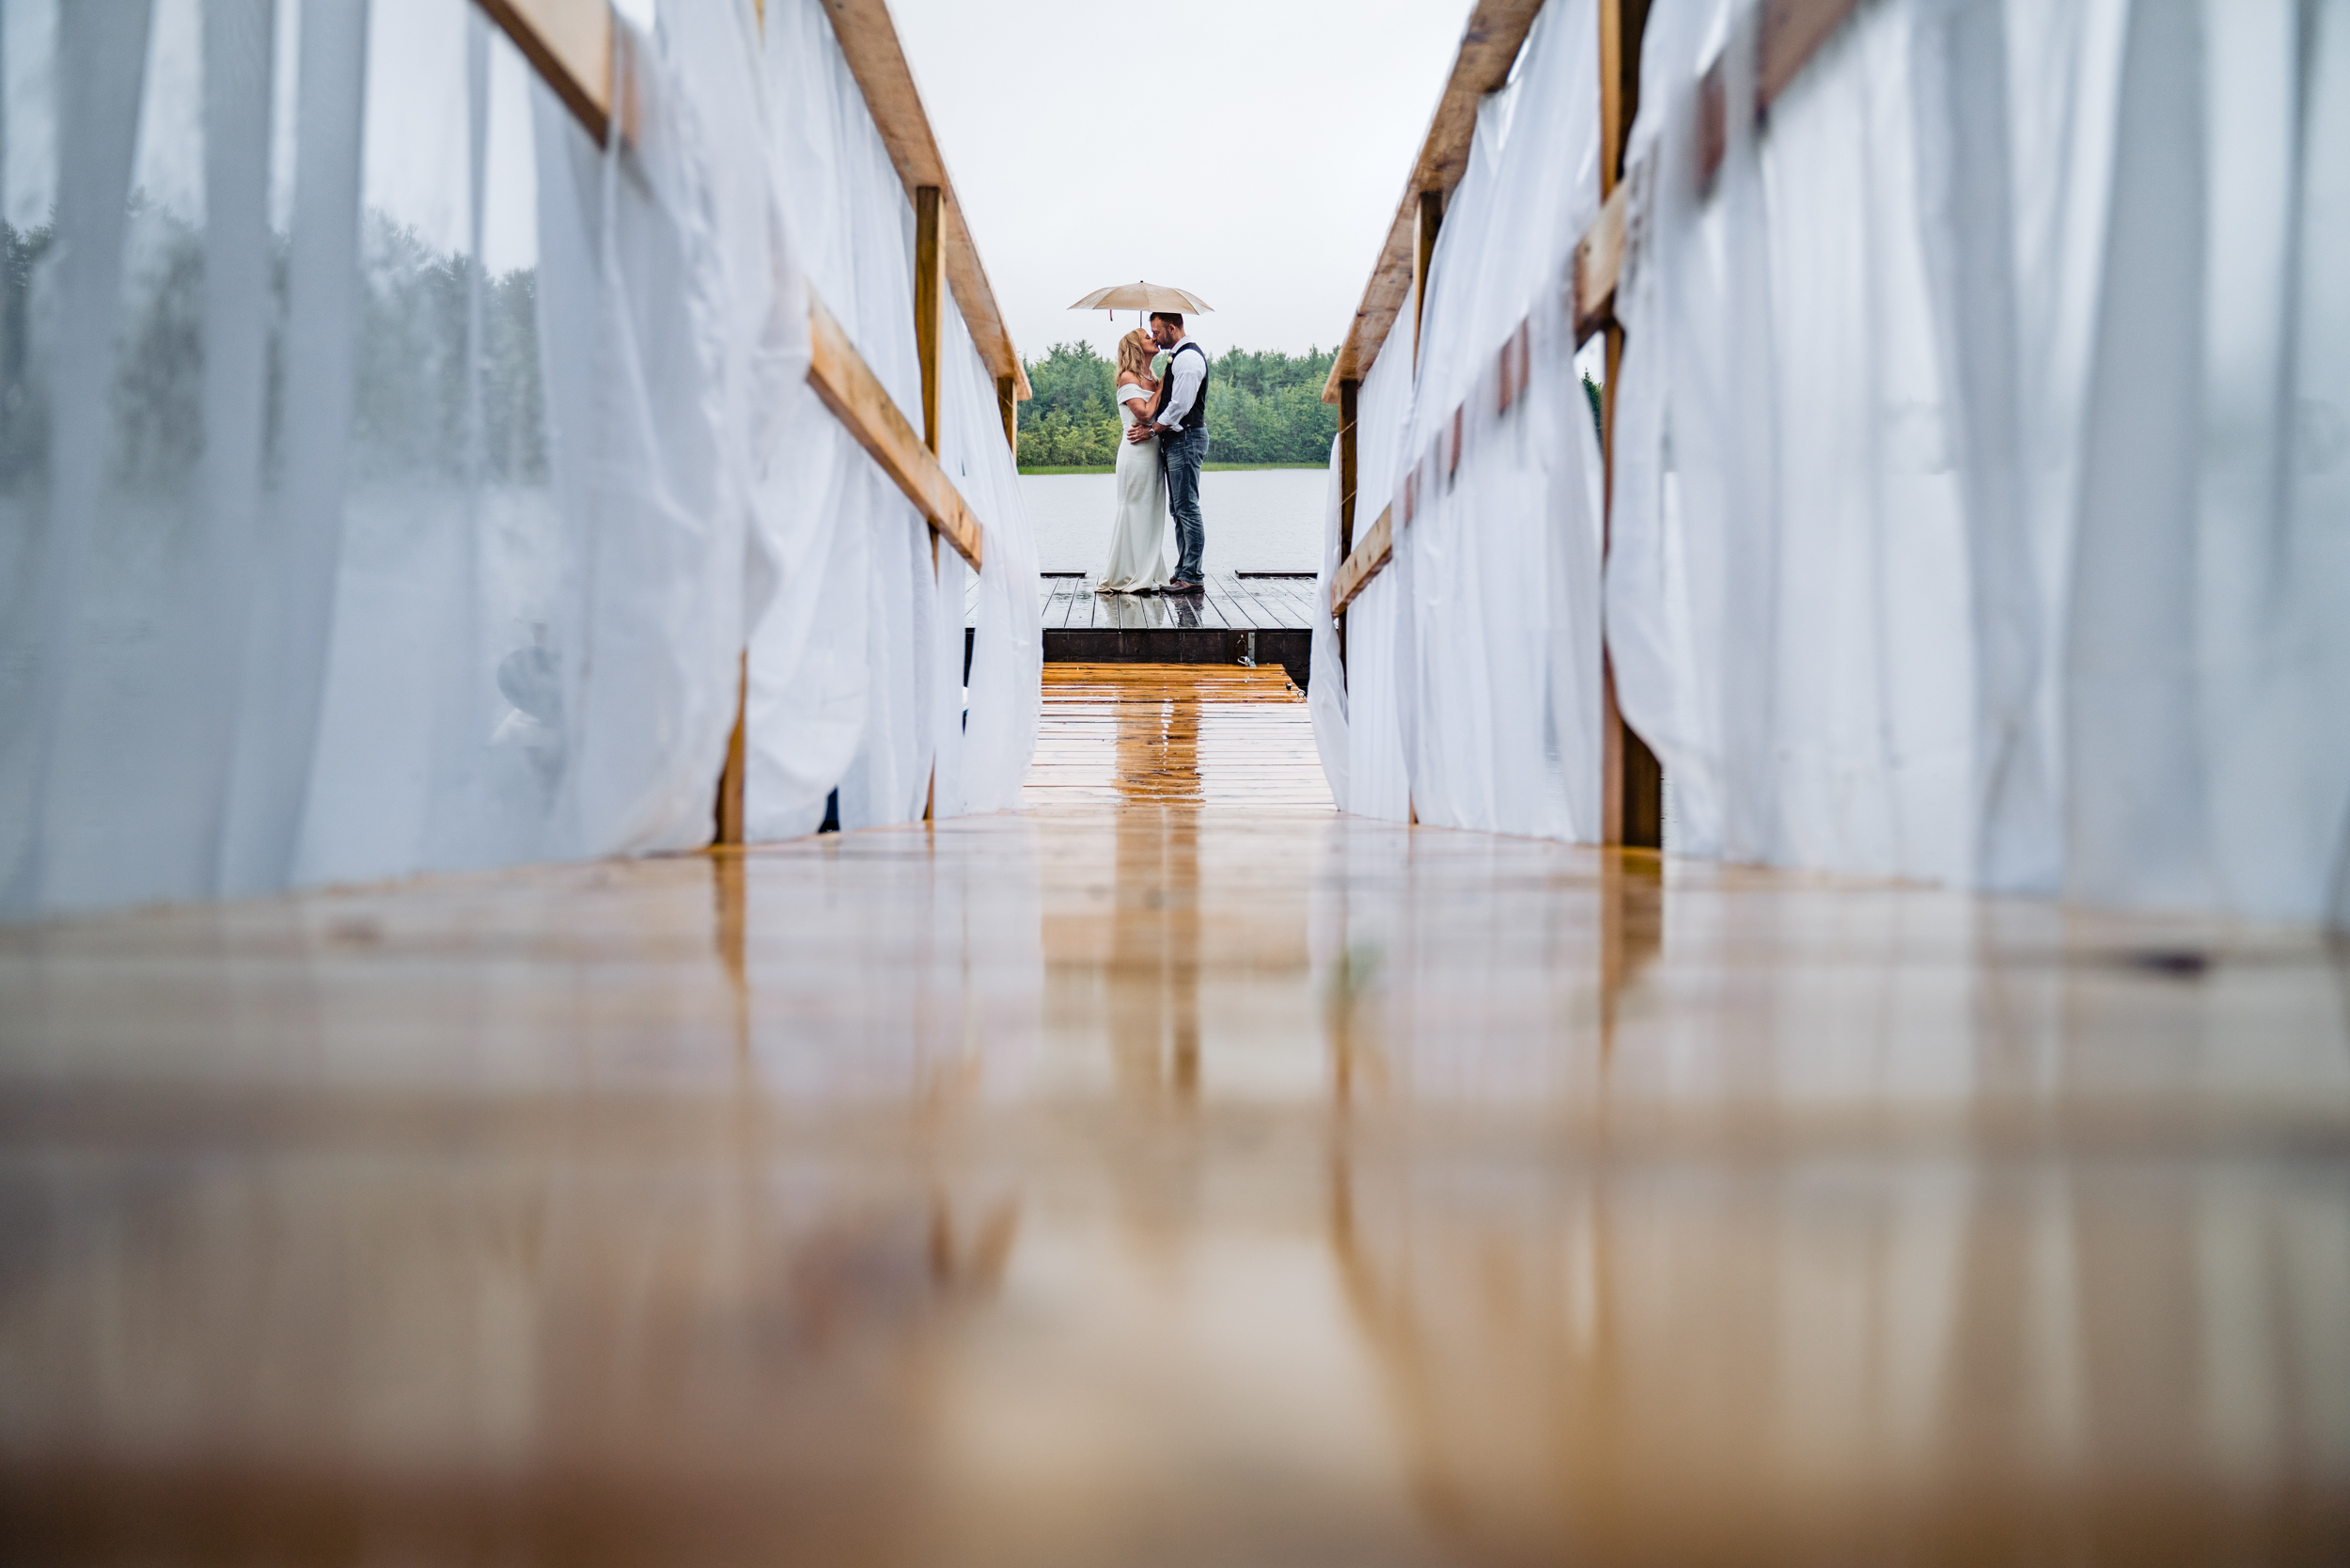 Halifax-wedding-photography-foxandfellow-nova-scotia-backyard-summer-canada-70.jpg